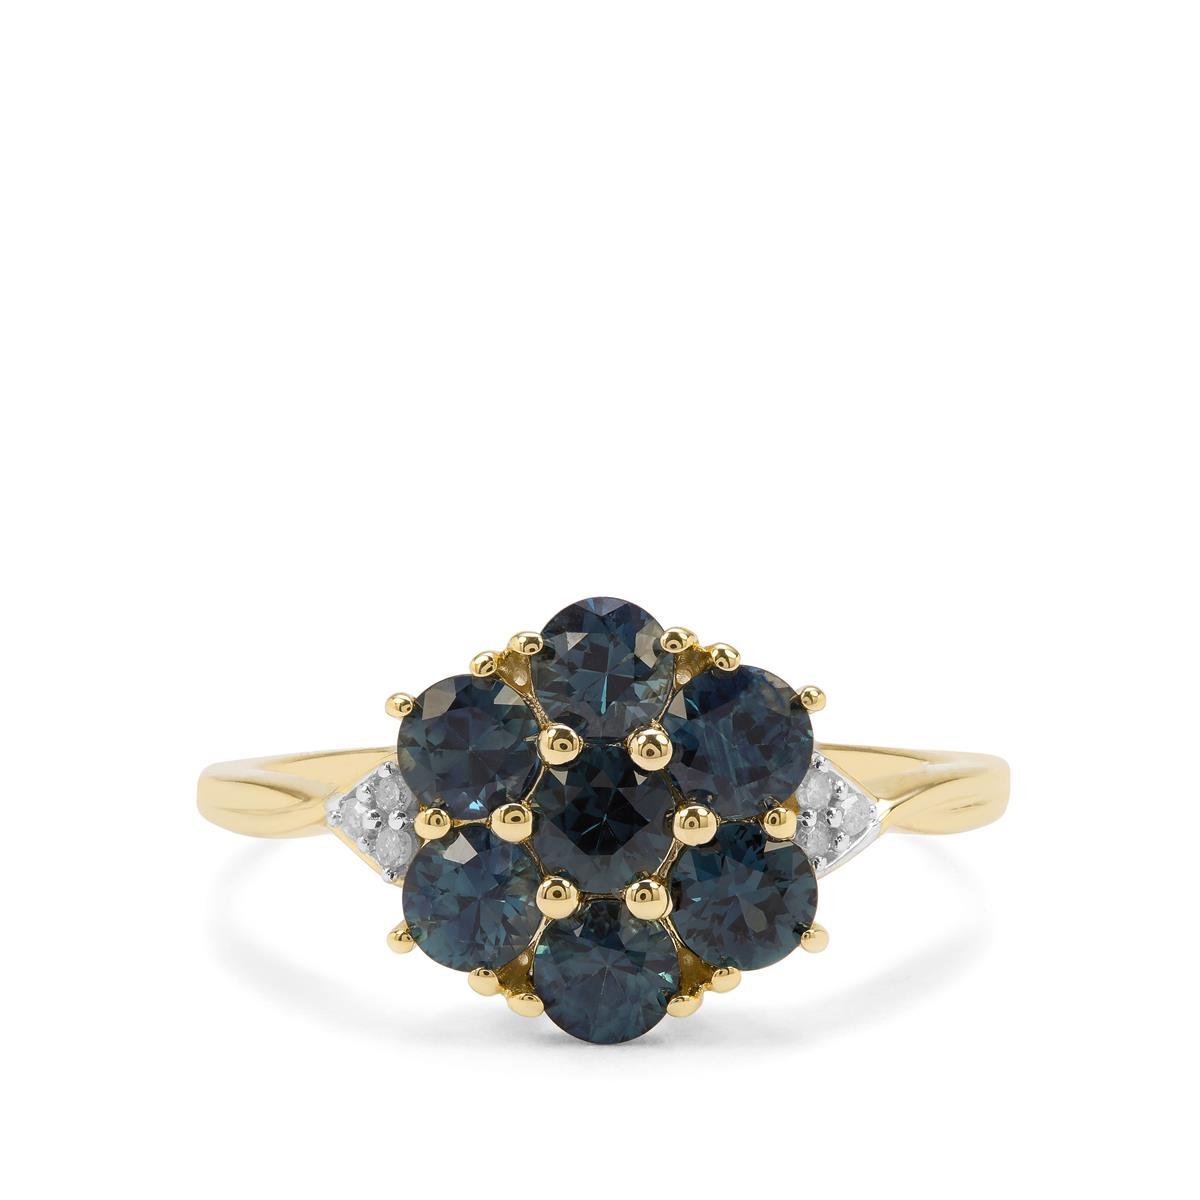 Australian Blue Sapphire /& White Sapphire 9K Gold Ring Gemporia R-S